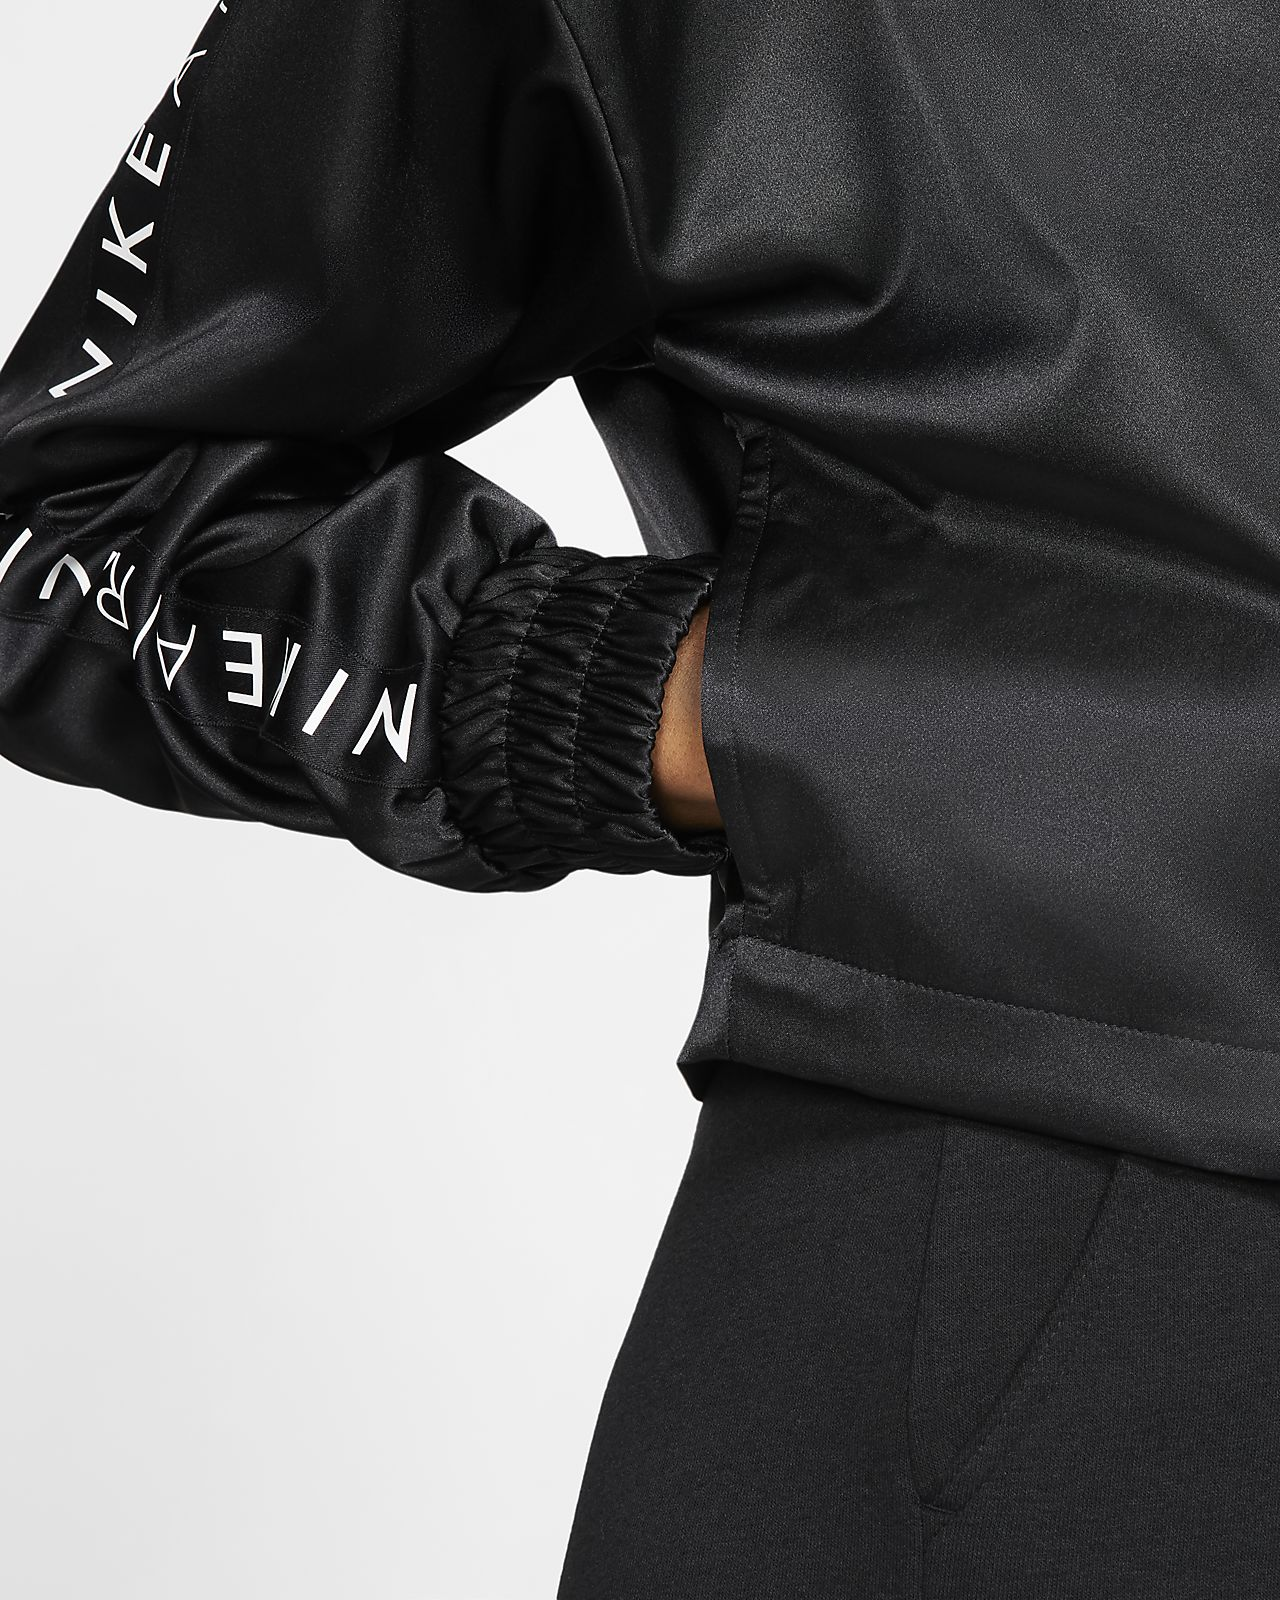 5b3d43c06 Nike Air Women's Satin Track Jacket